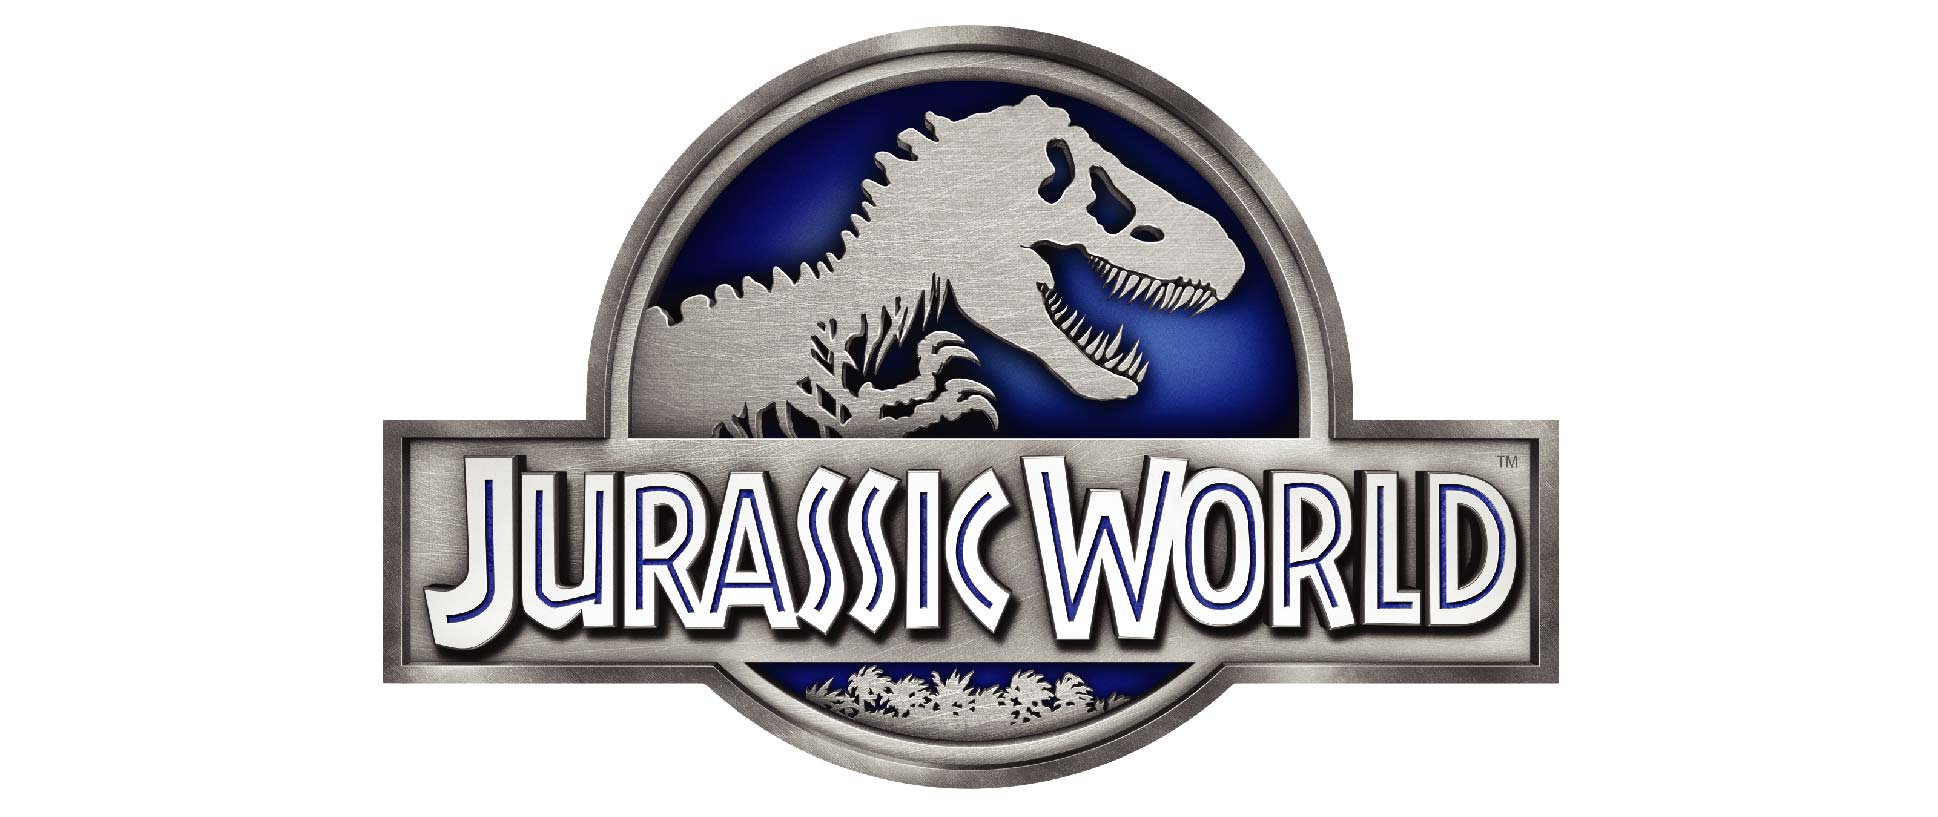 Jurassic World's Sponsorship Campaign.